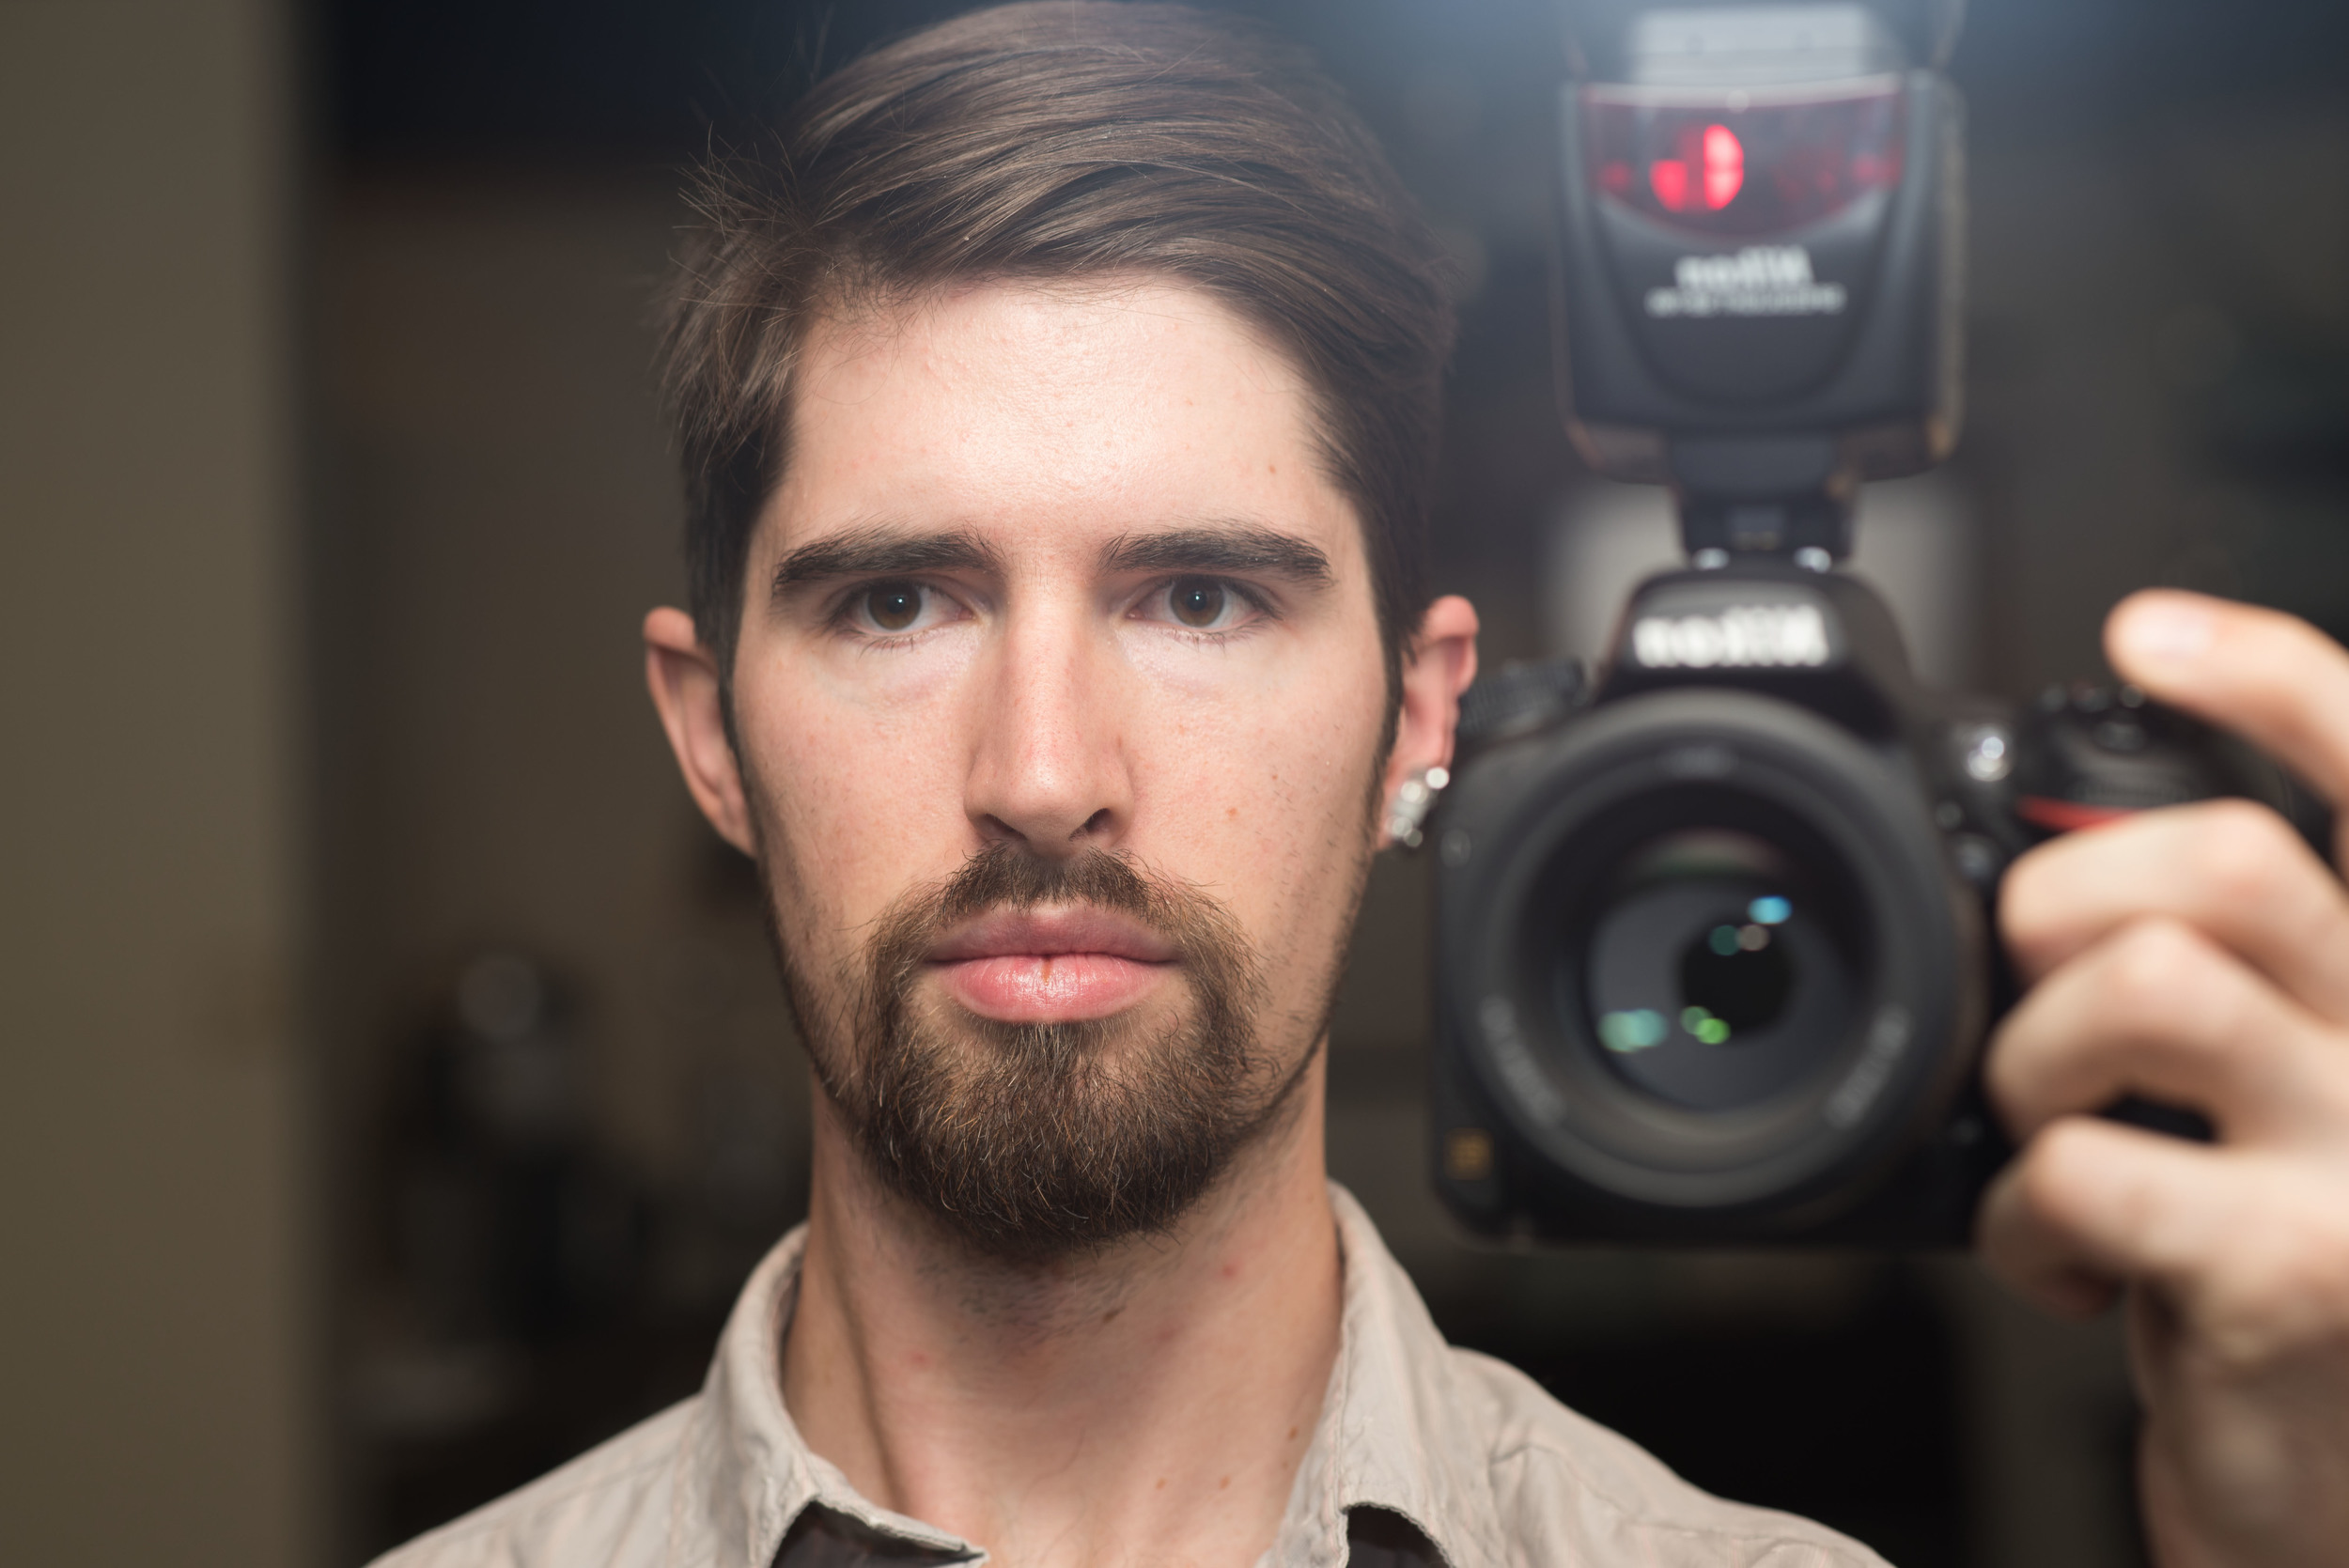 Nikon D750 Test Shot Selfie